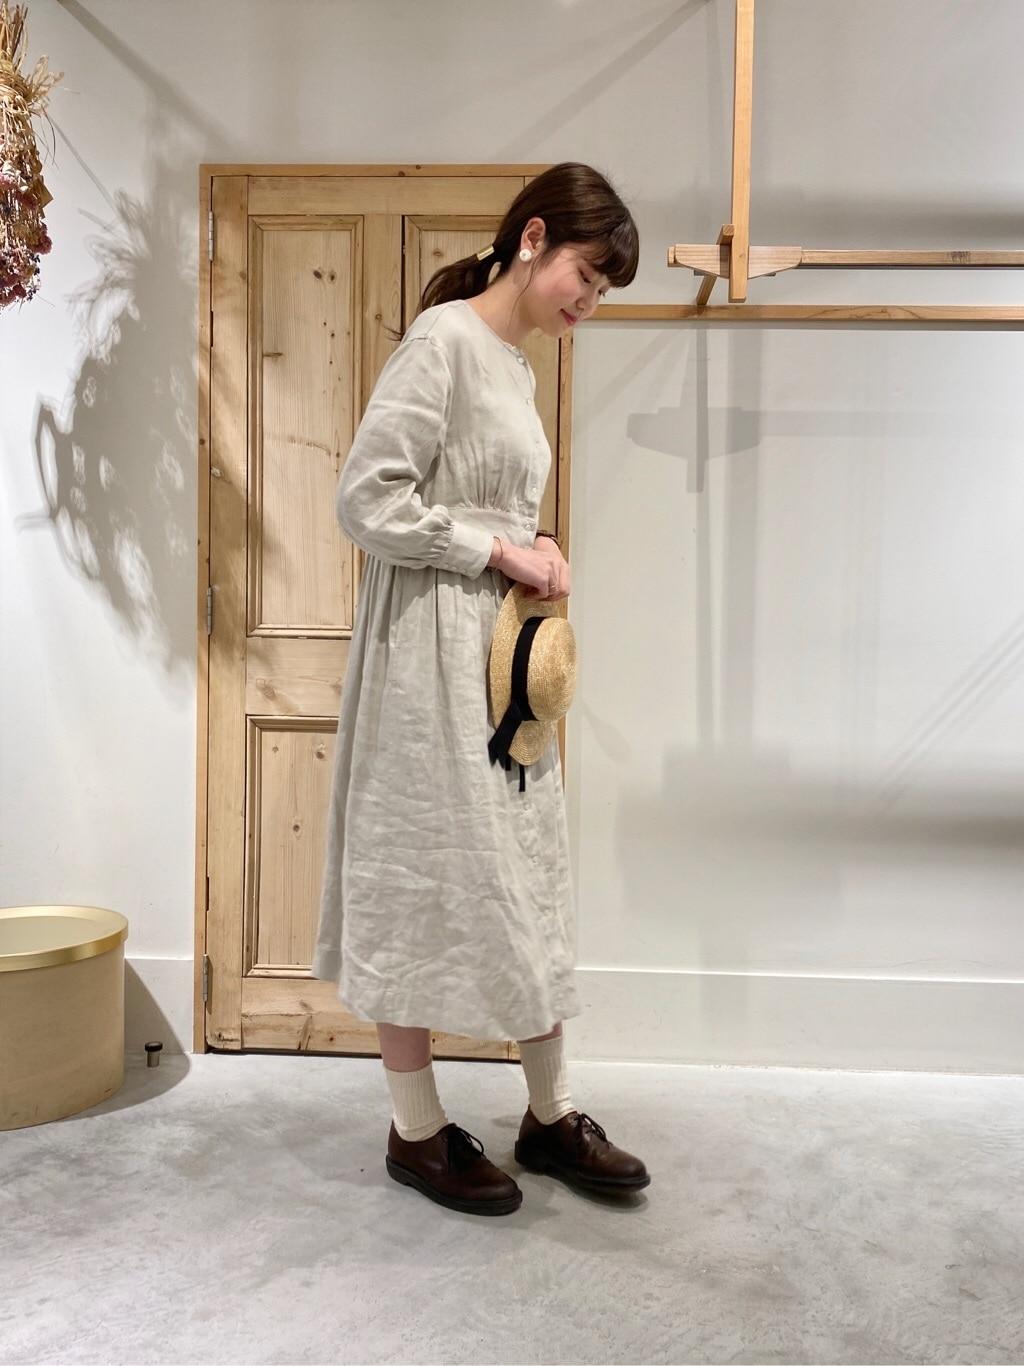 Malle chambre de charme 調布パルコ 身長:167cm 2020.03.13